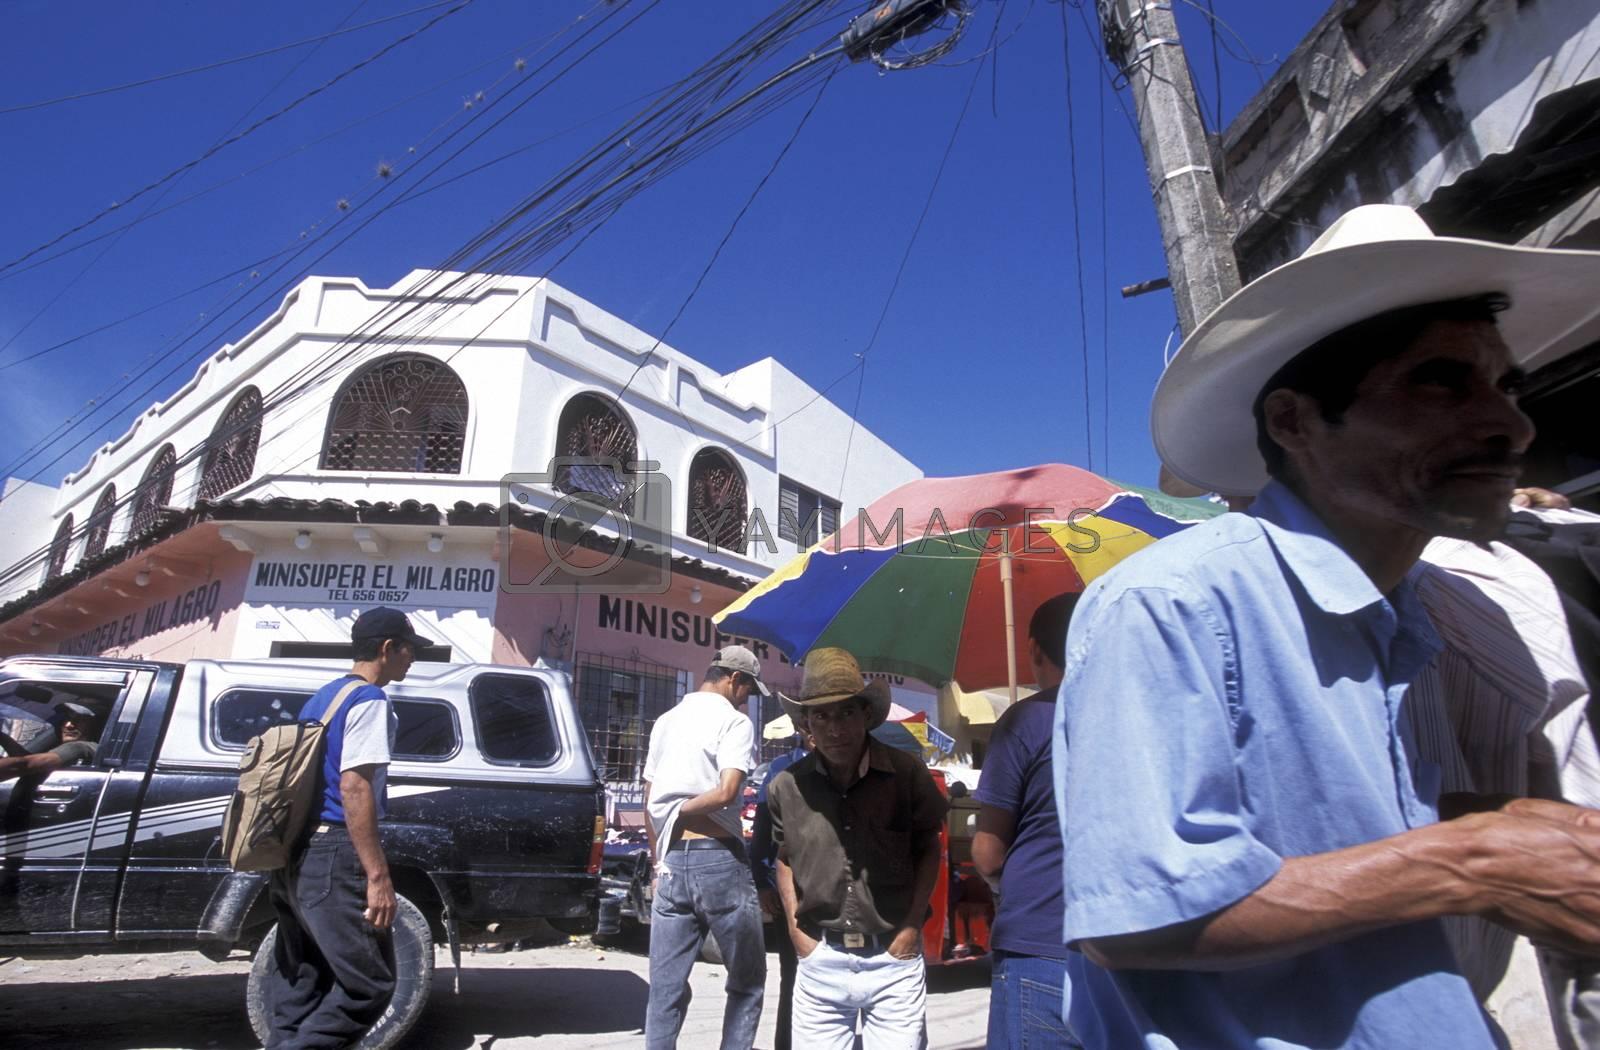 LATIN AMERICA HONDURAS SAN PEDRO SULA by urf